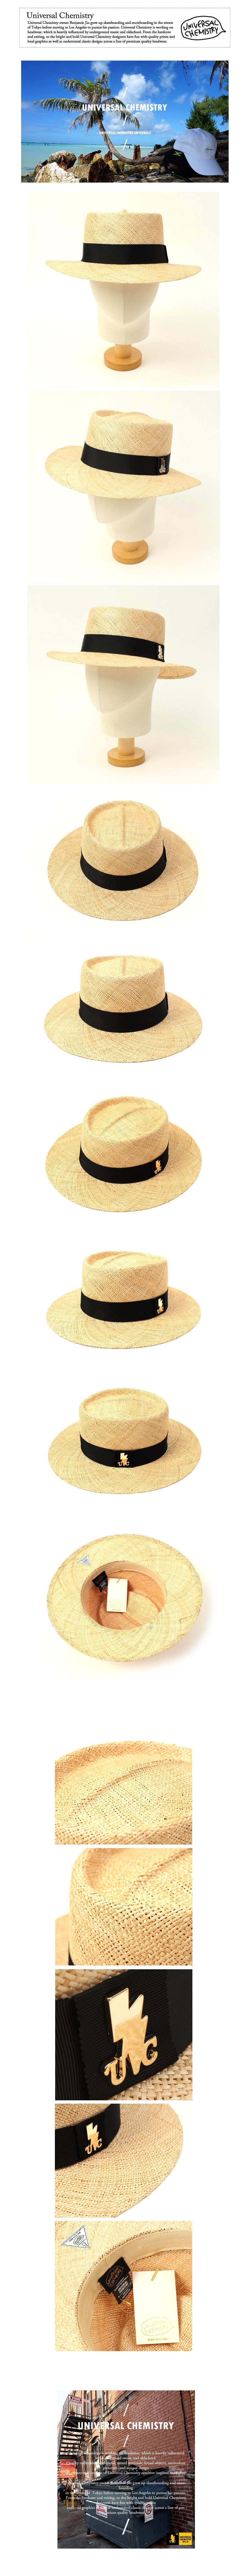 GDMT Bau Jungle Panama Hat 여름페도라